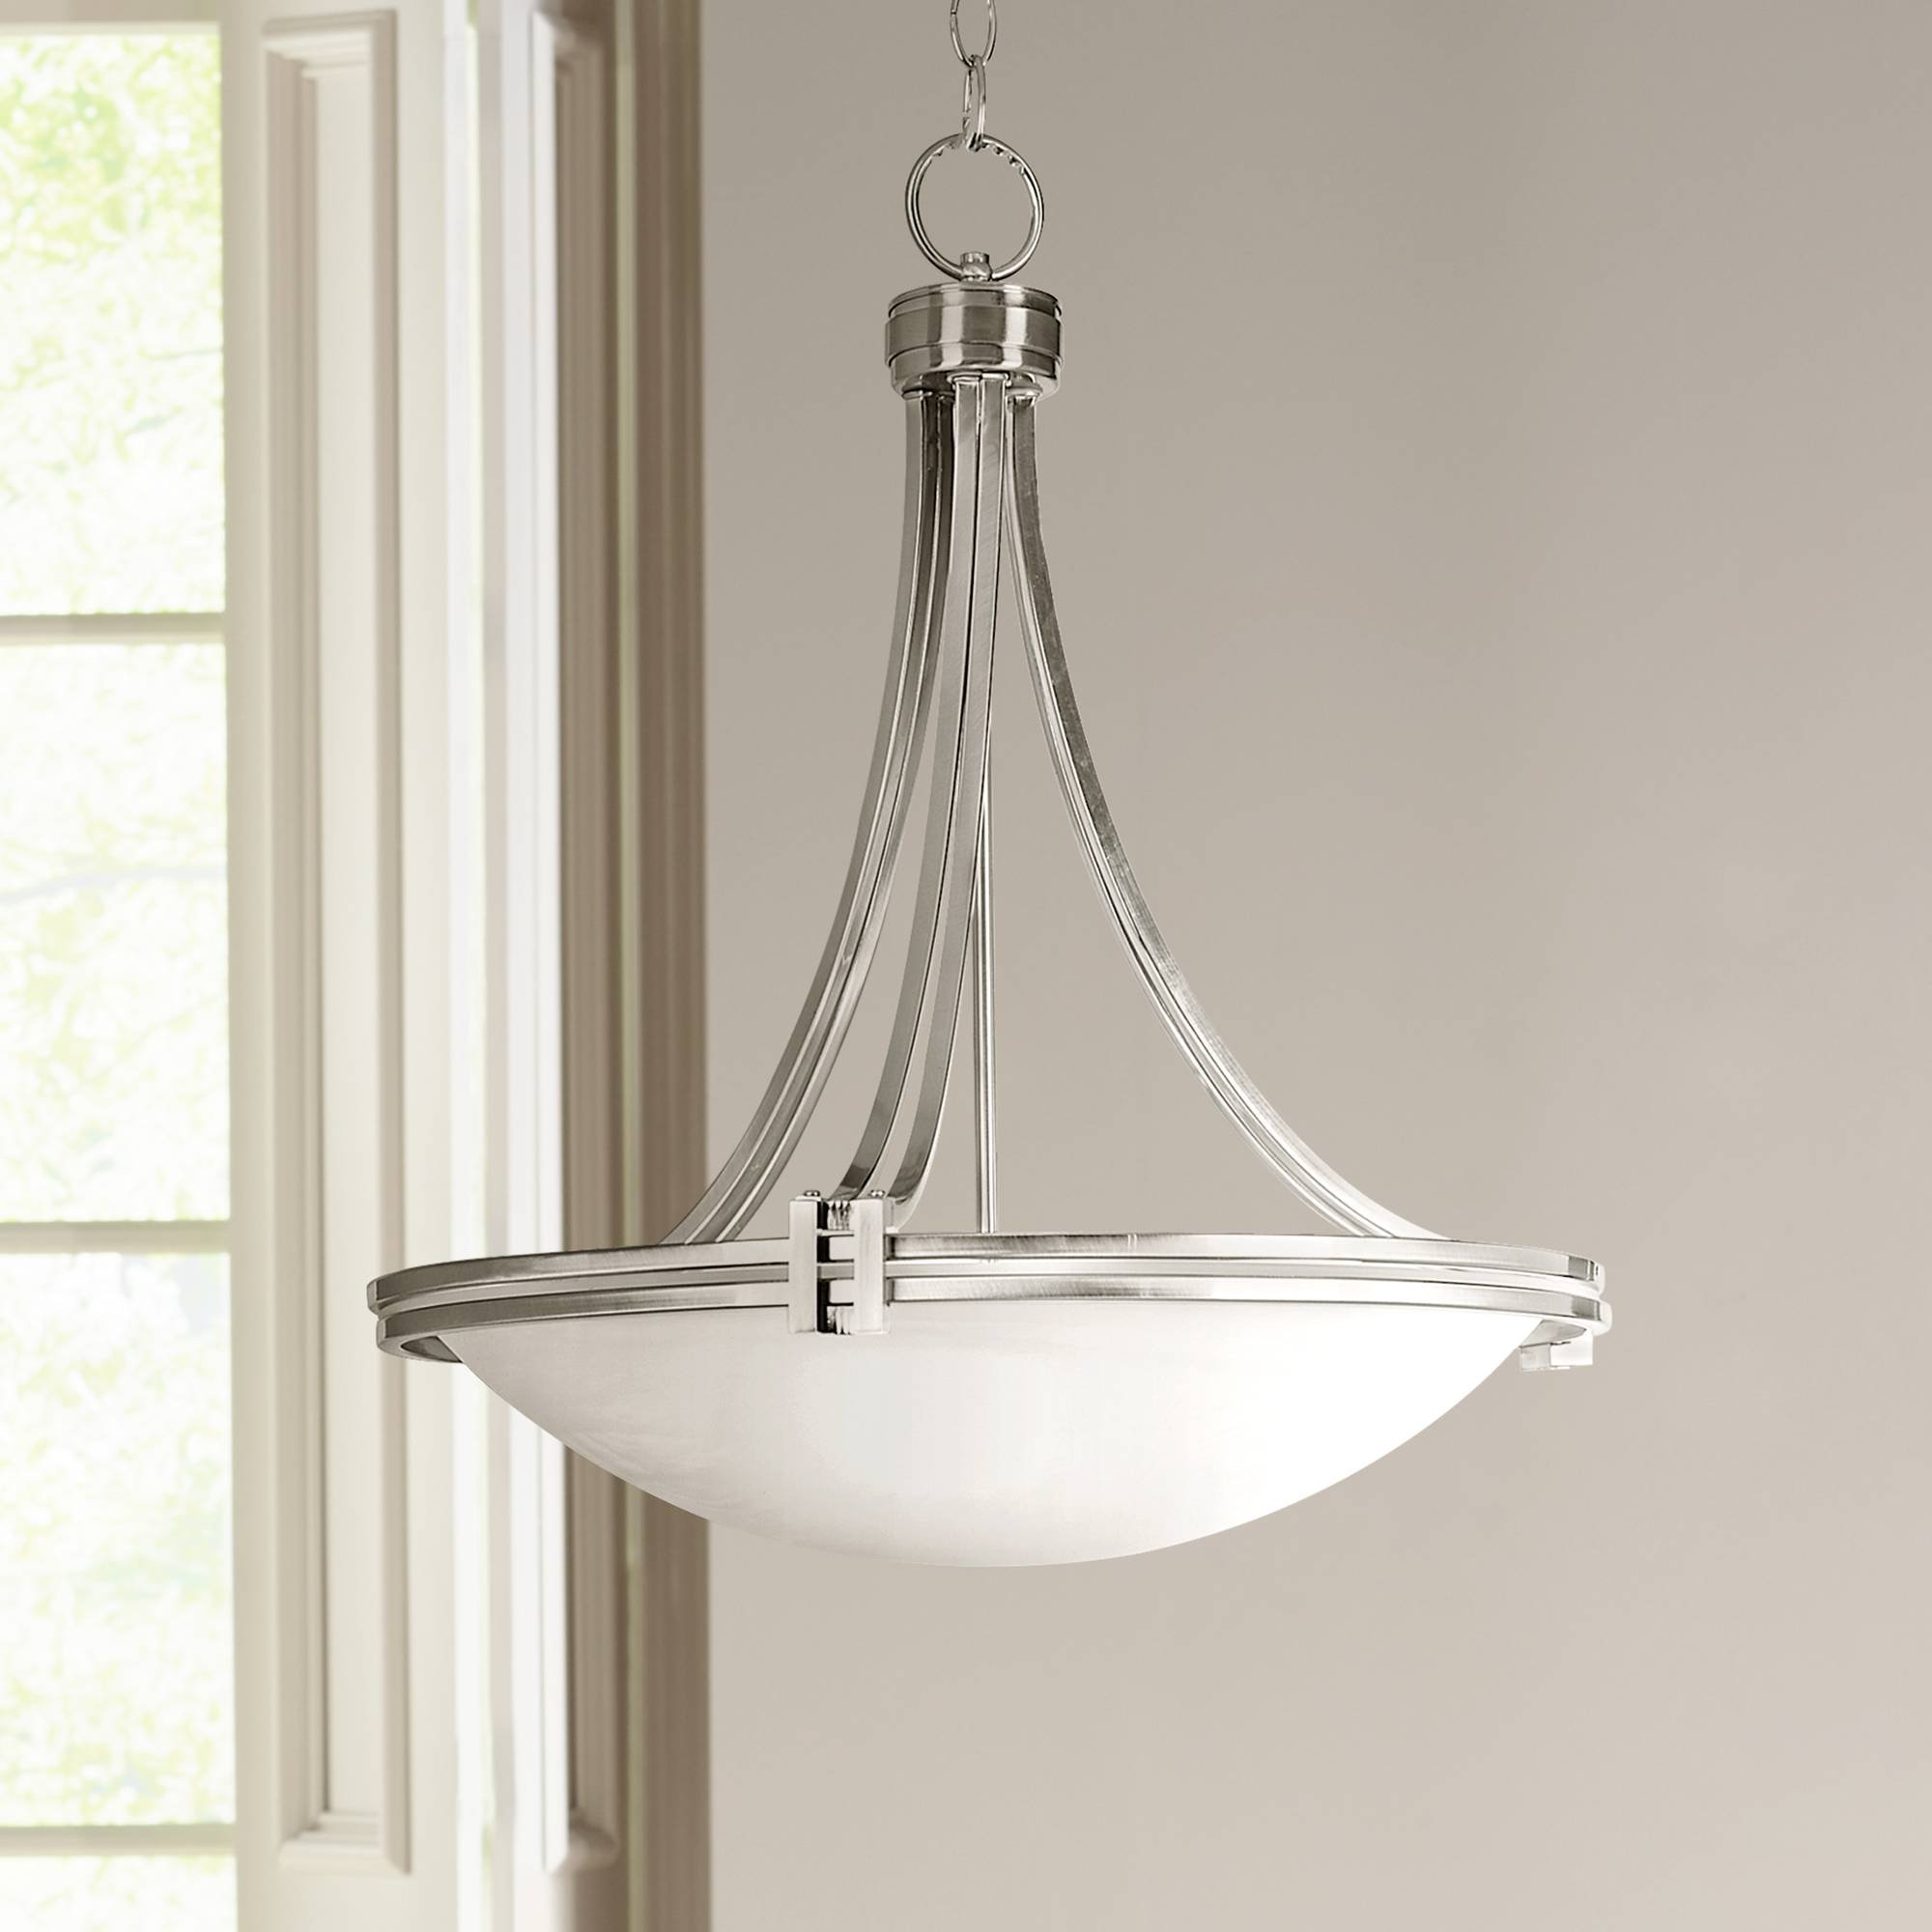 Deco Brushed Nickel Pendant Light 21 1/2'' Wide Marbleized Glass Fixture for Kitchen Dining Room Lighting - Possini Euro Design